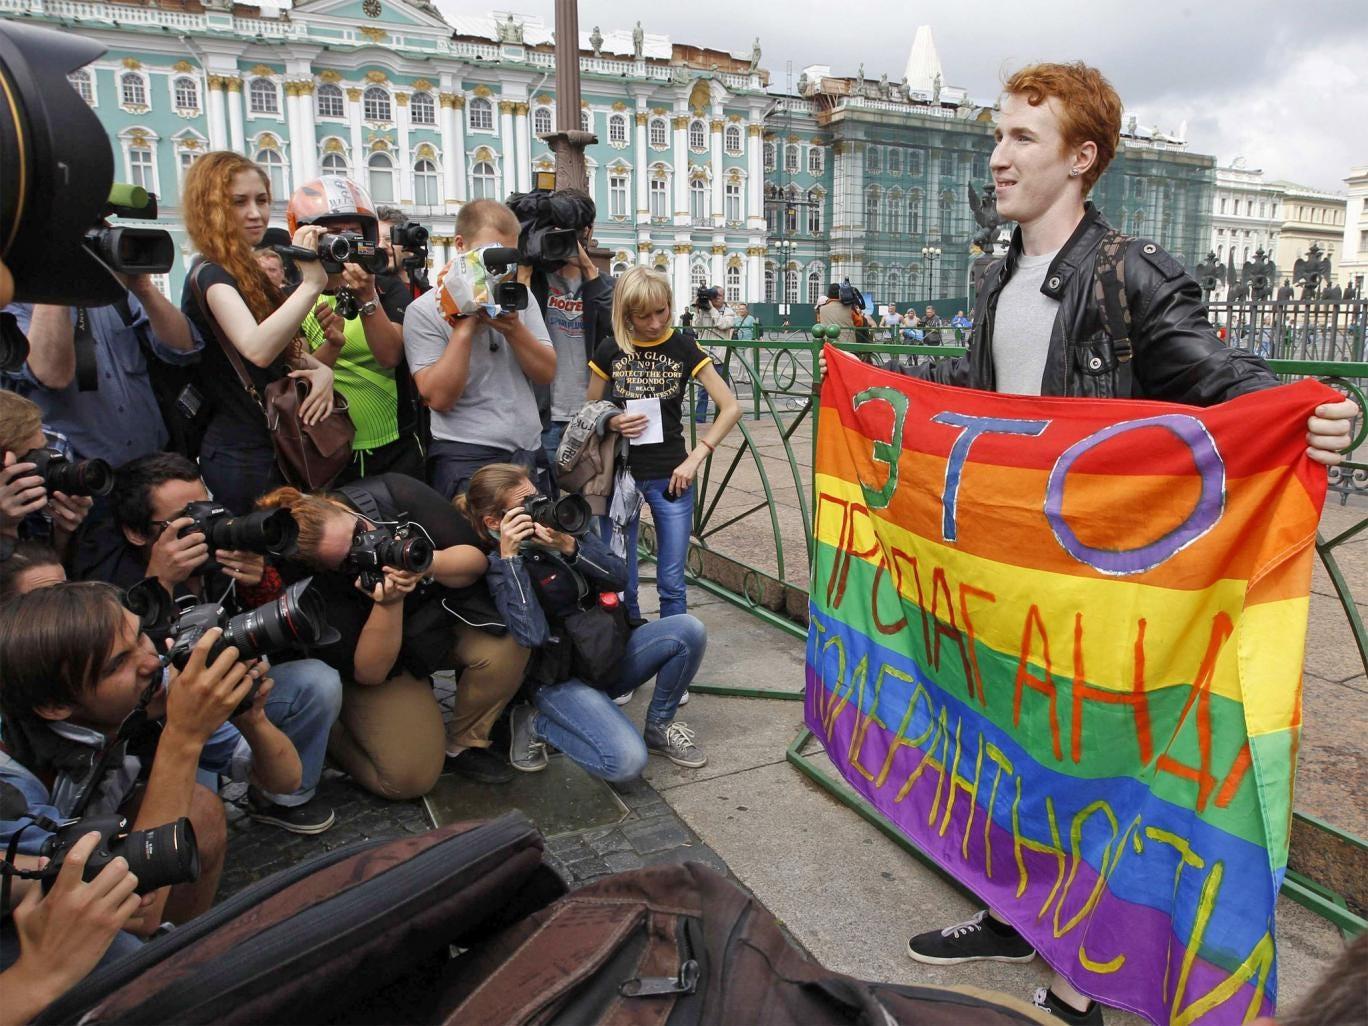 A gay rights activist in St. Petersburg last week